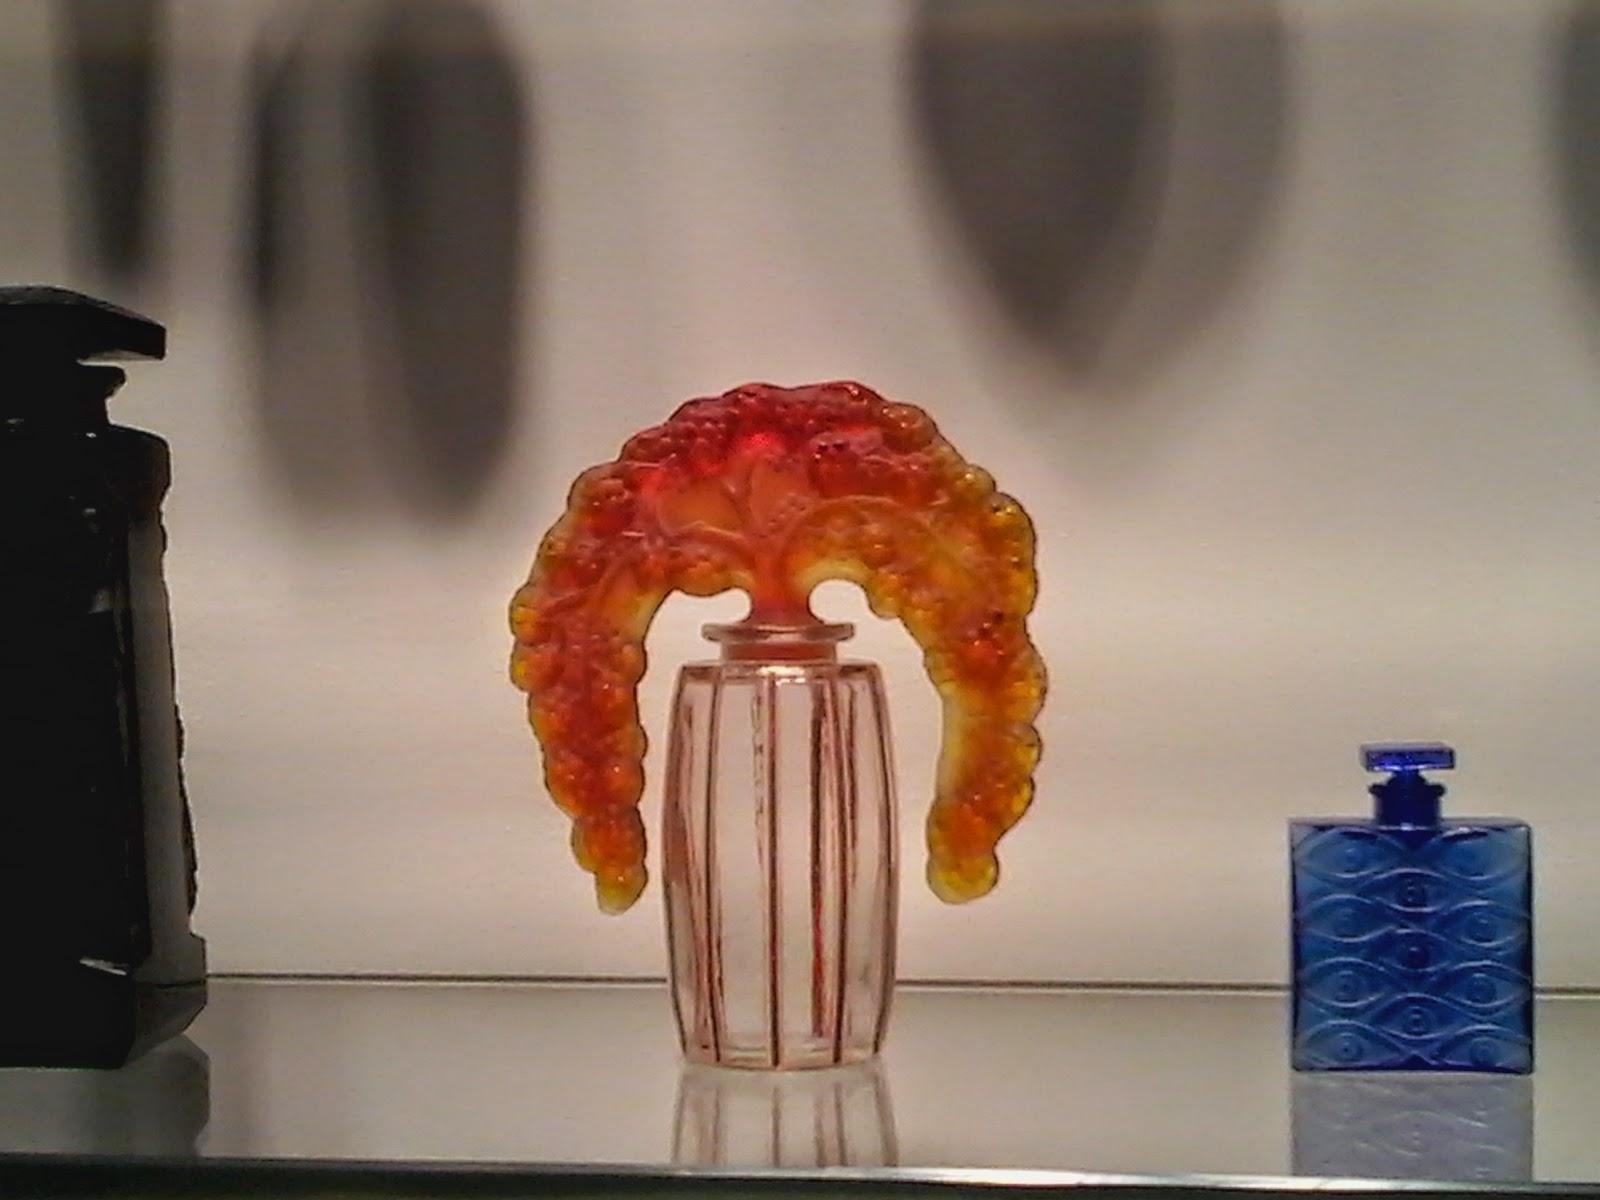 muzeul sticlei corning sua_2014 (8)